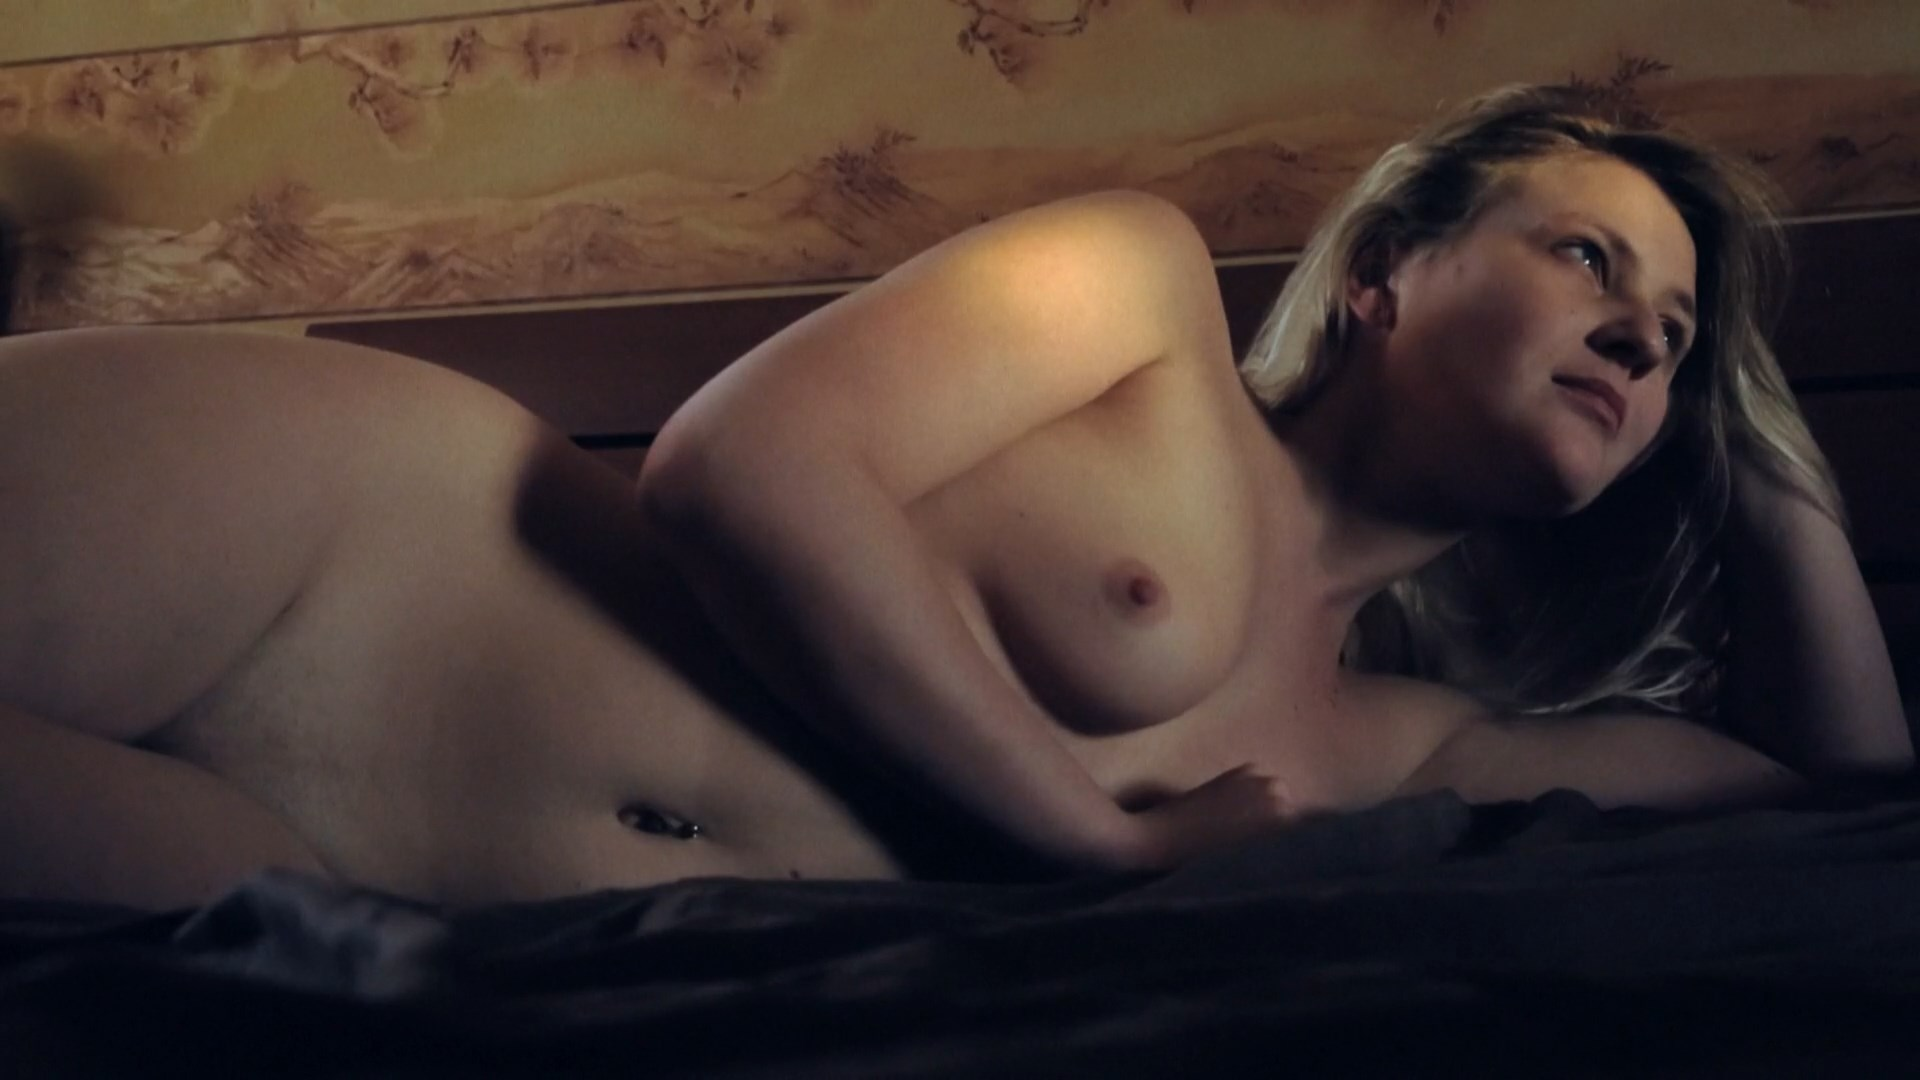 Heather heavenly porn star